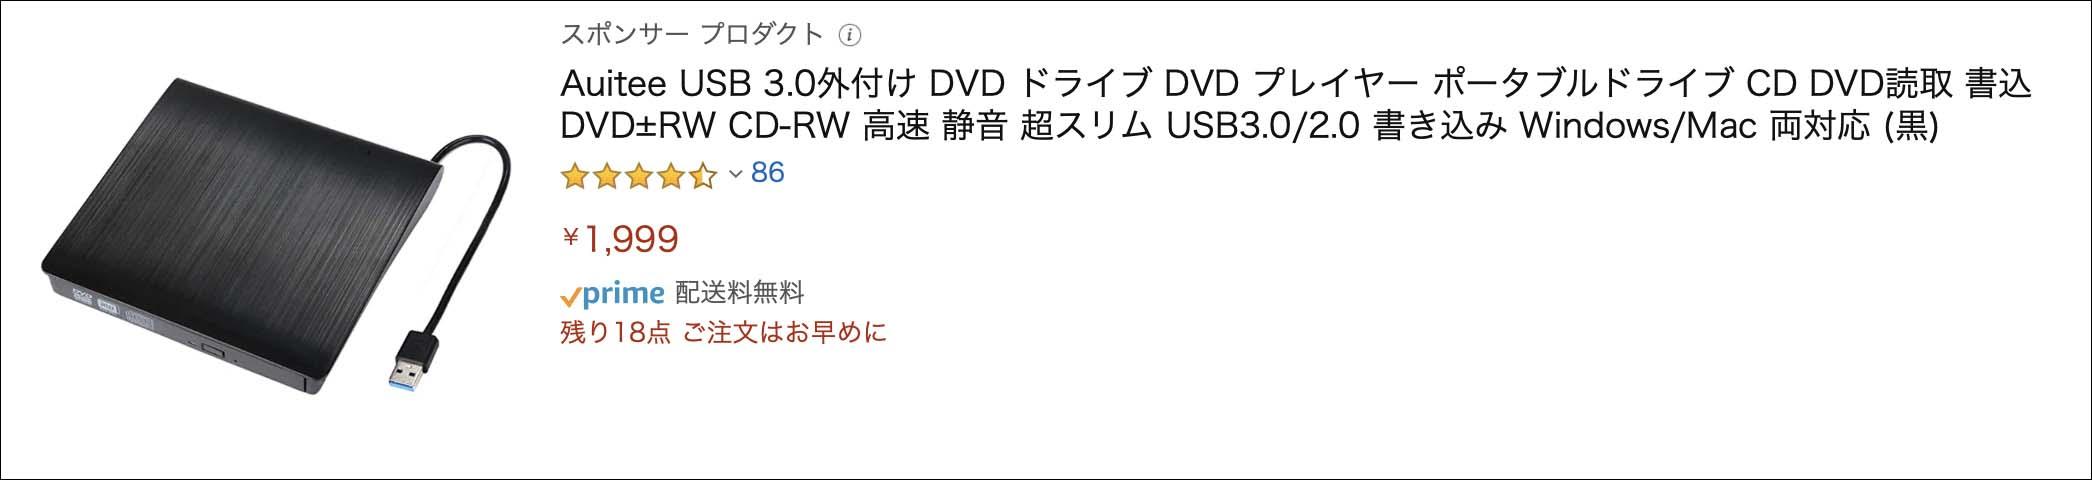 Auitee外付けDVDドライブ(Amazon)